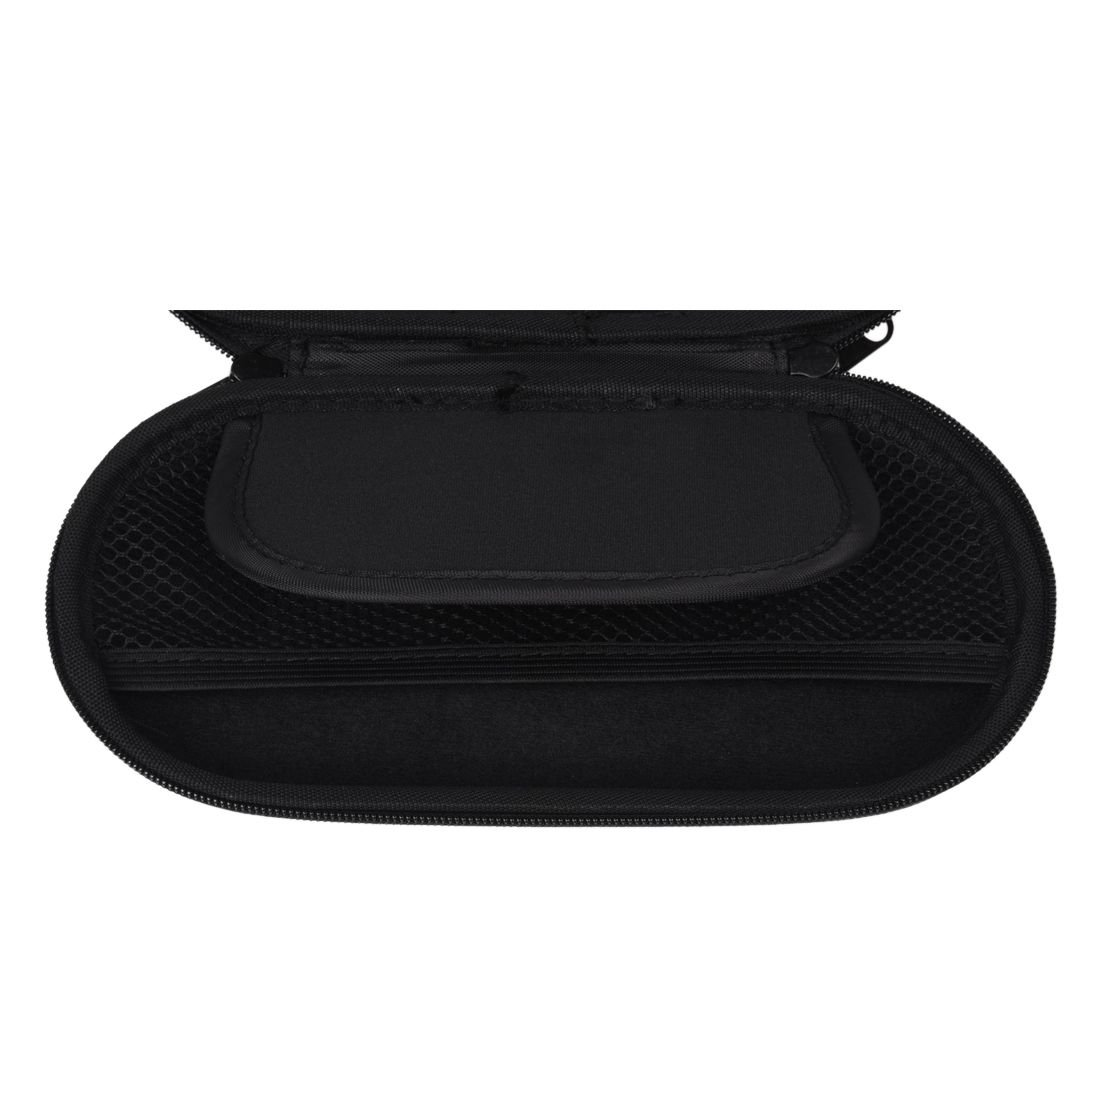 Cikuso Funda de Caja EVA Negro con Mosqueton para PSVITA Consola de Videojuegos